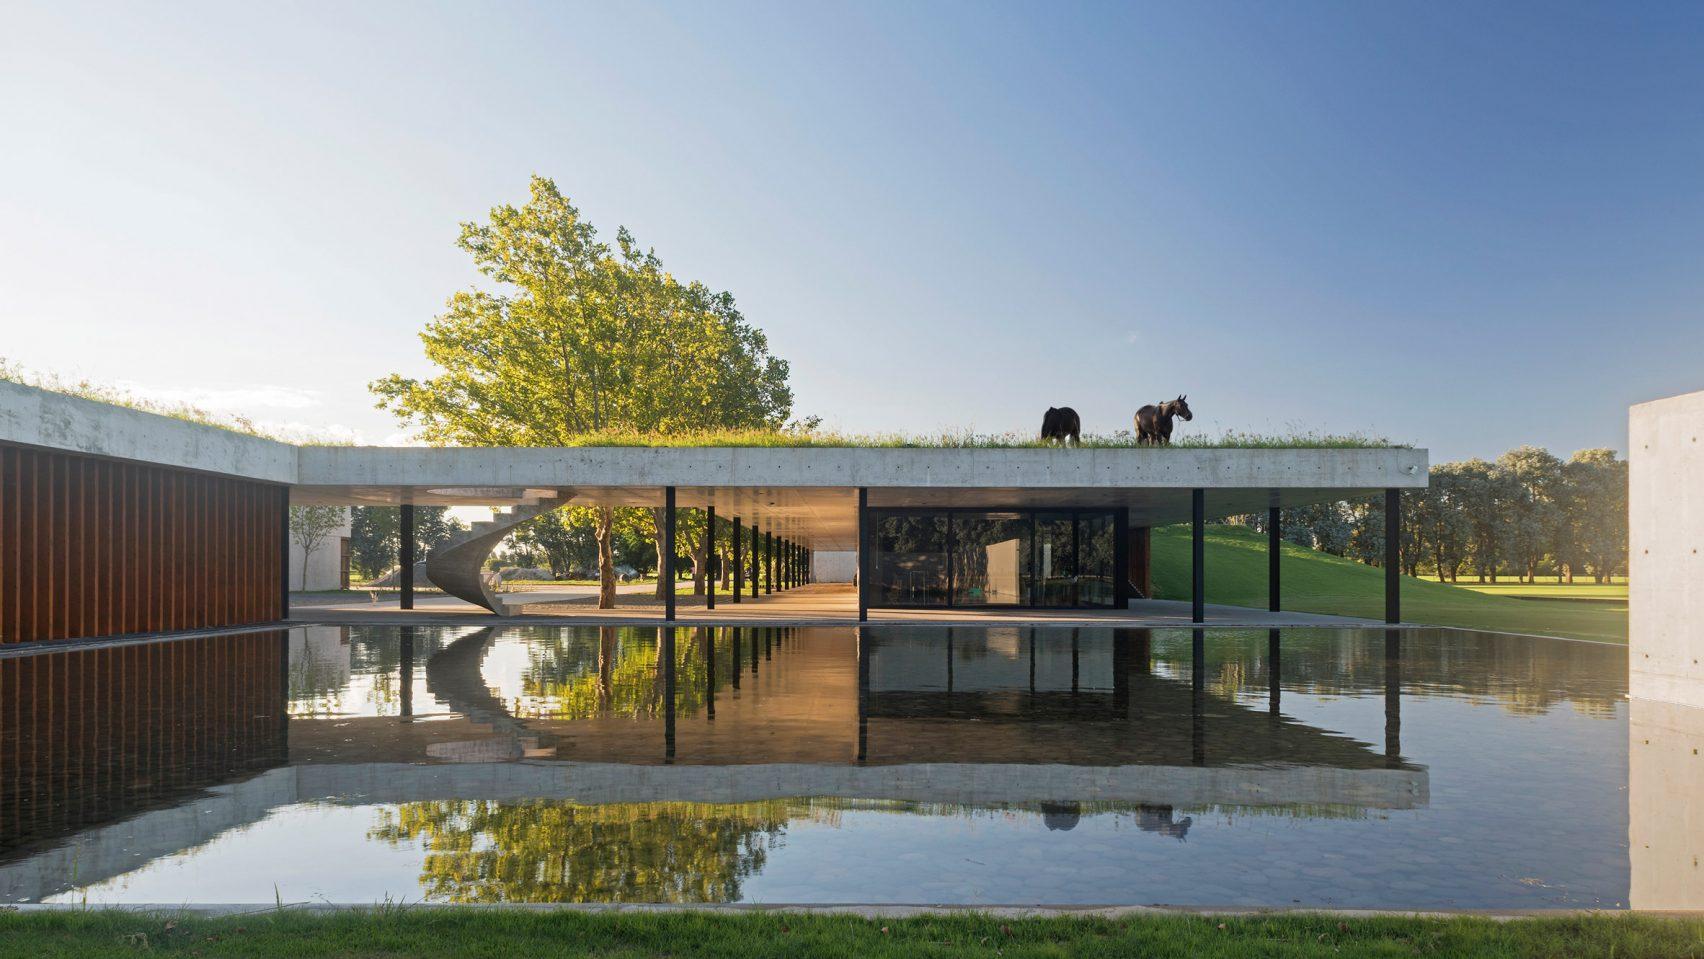 figueras-polo-stables-estudio-ramos-architecture-public-and-leisure_dezeen_hero-1-1-1704x959.jpg